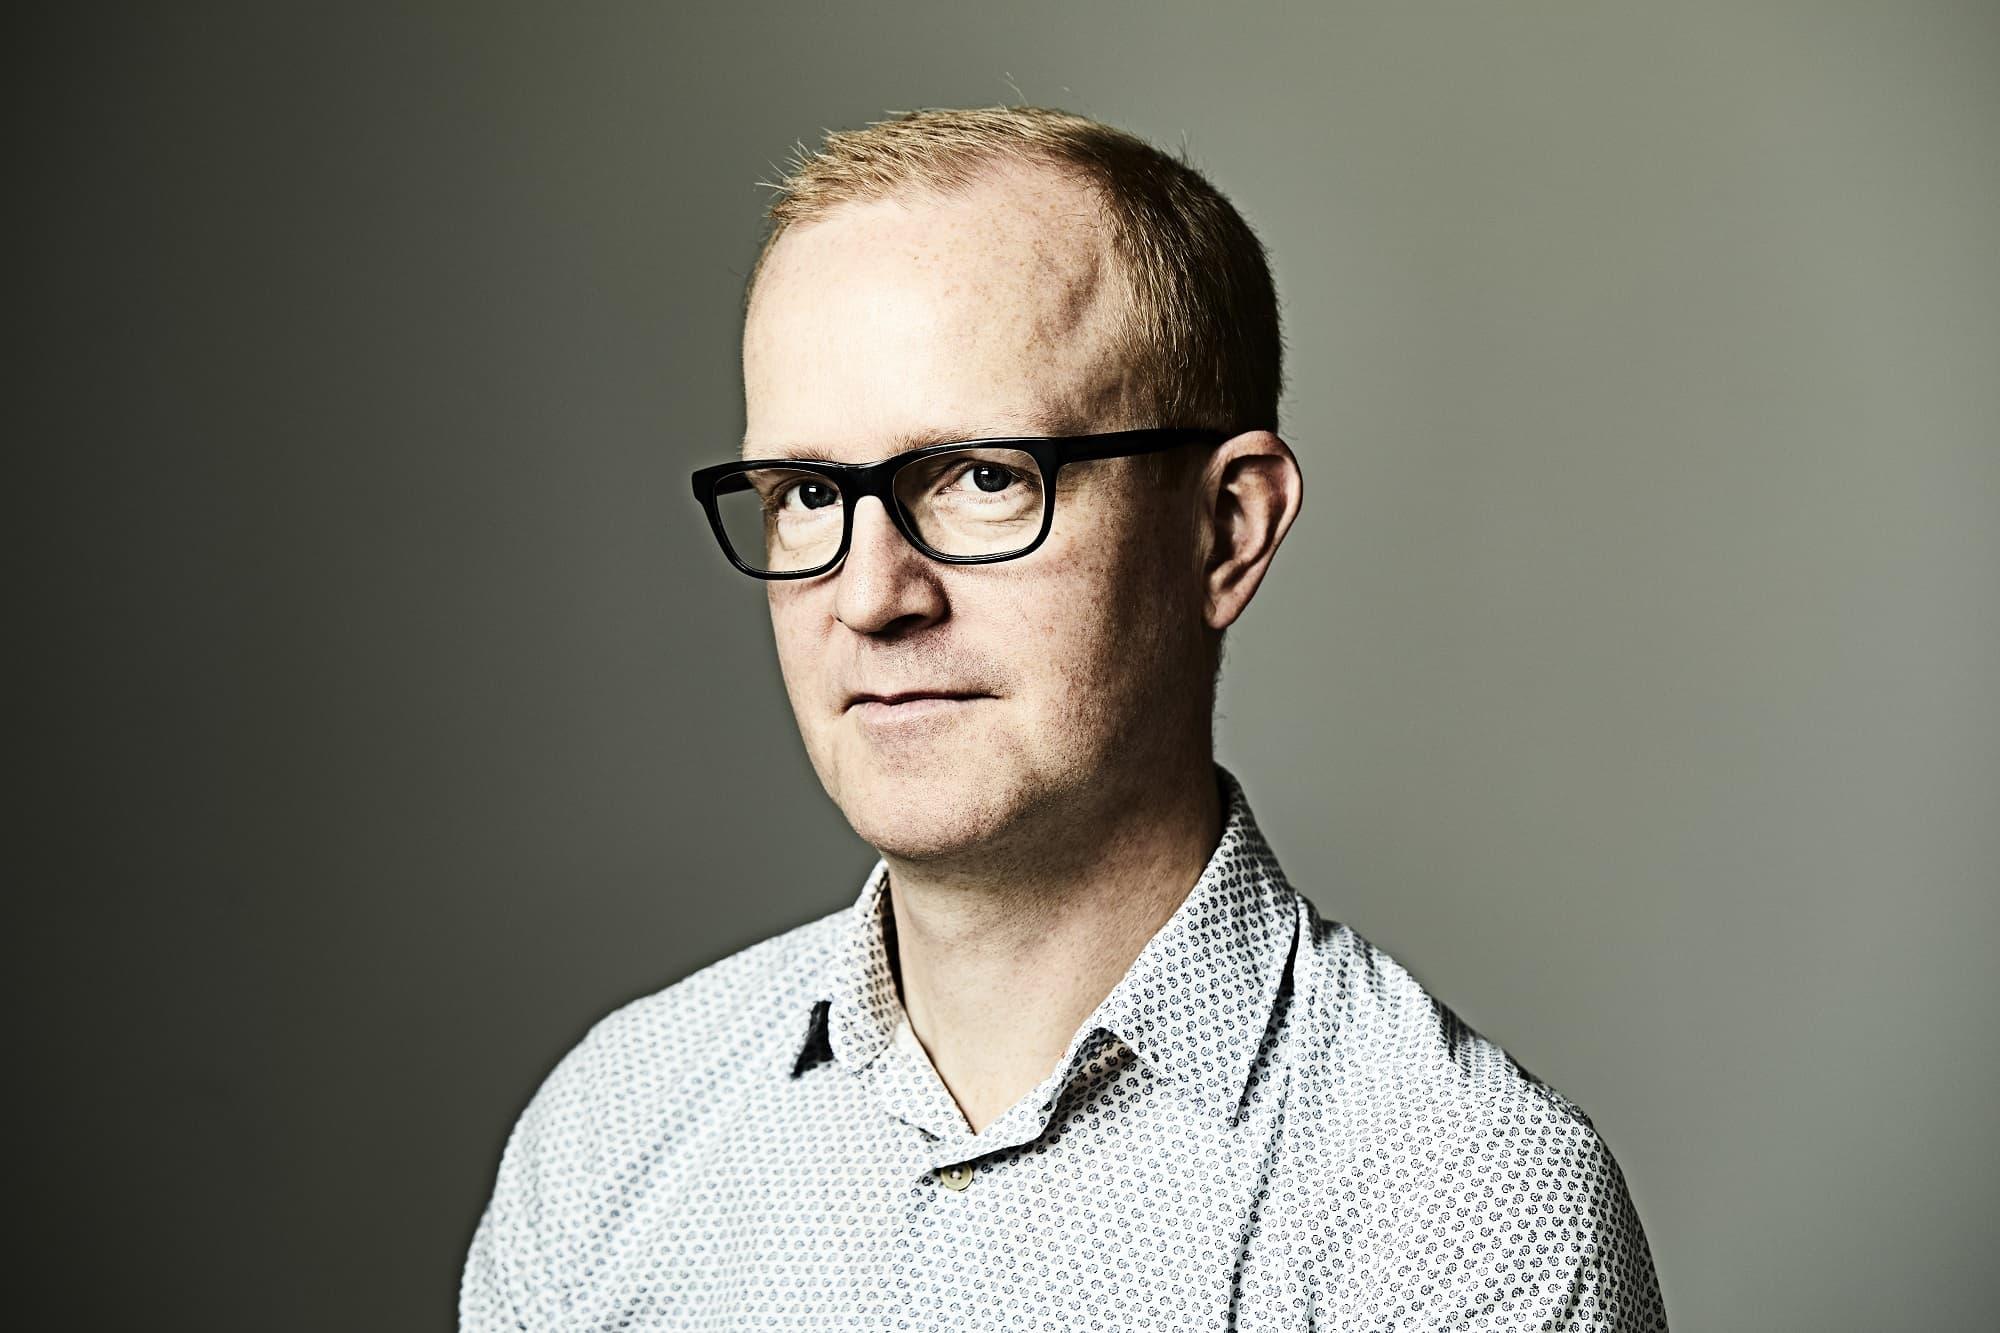 Picture of Rene Langdahl Jorgensen